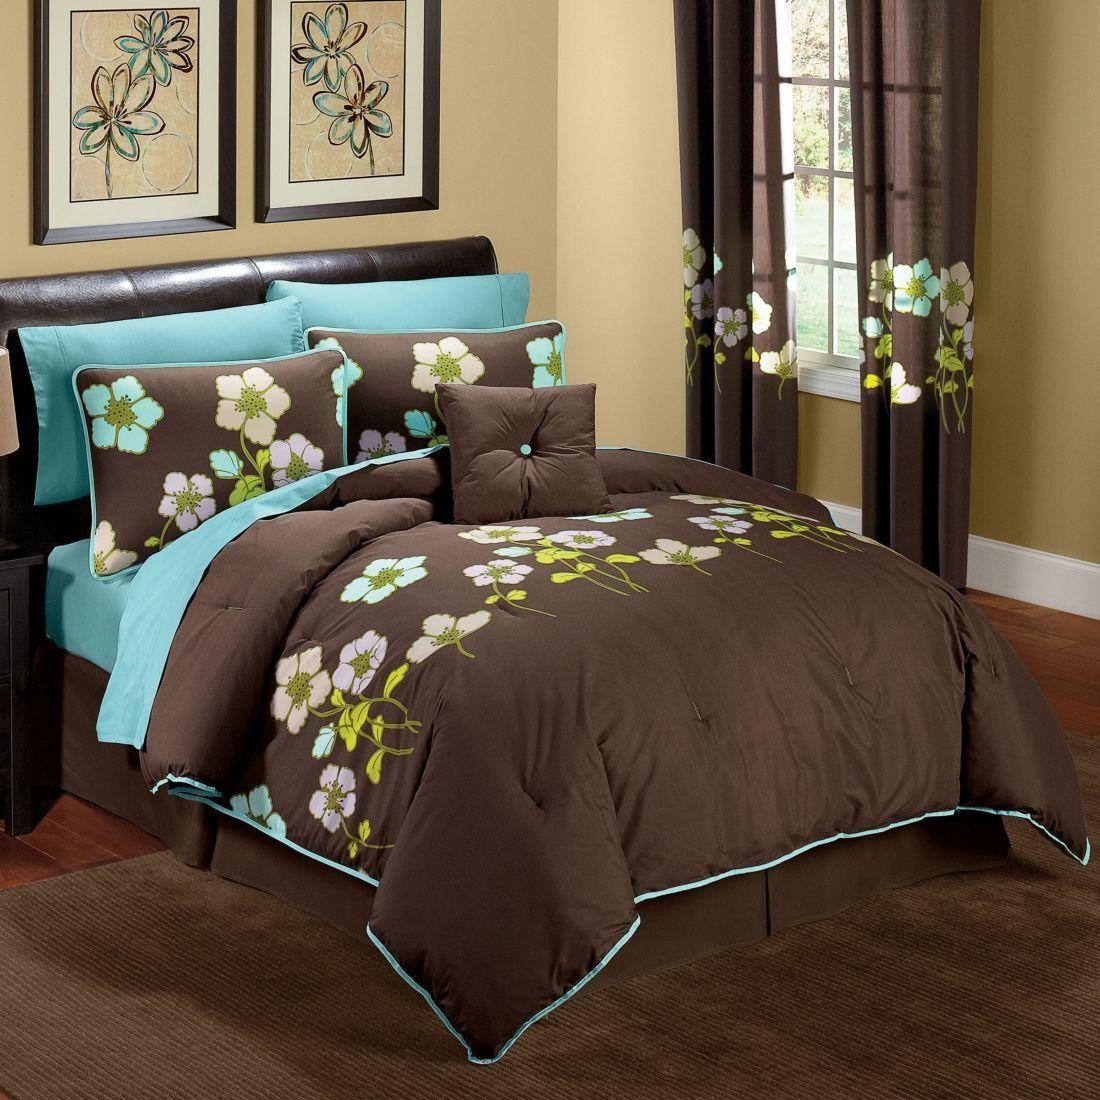 Brown bedroom decorating ideas heavenly brown turquoise bedroom interior design